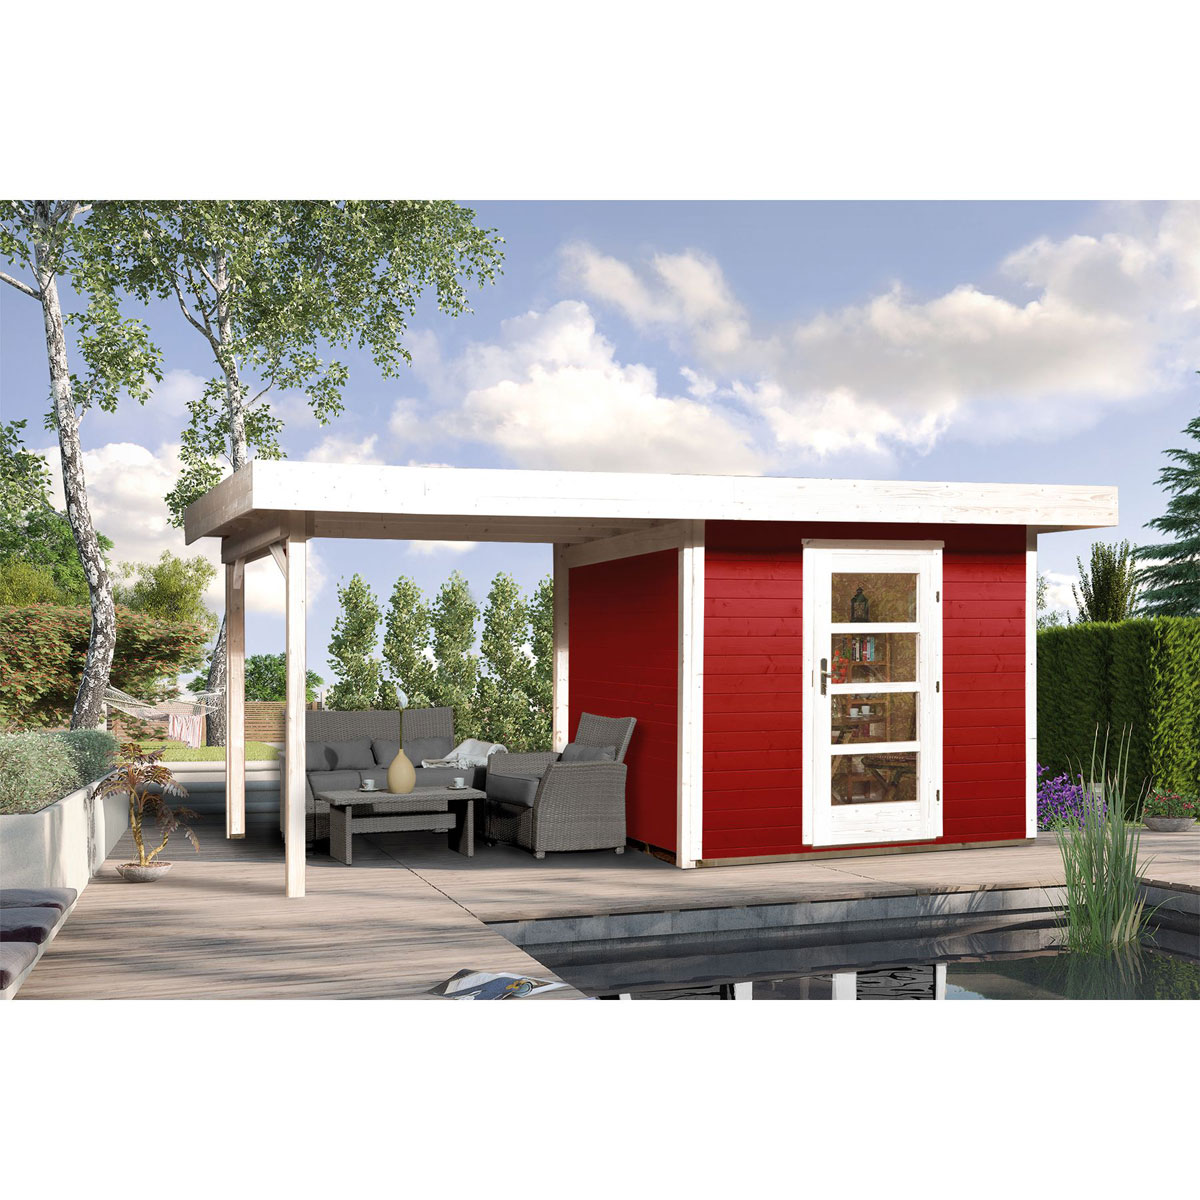 "Gartenhäuser - Designhaus ""172 B"" Gr.2, schwedenrot  - Onlineshop Hellweg"